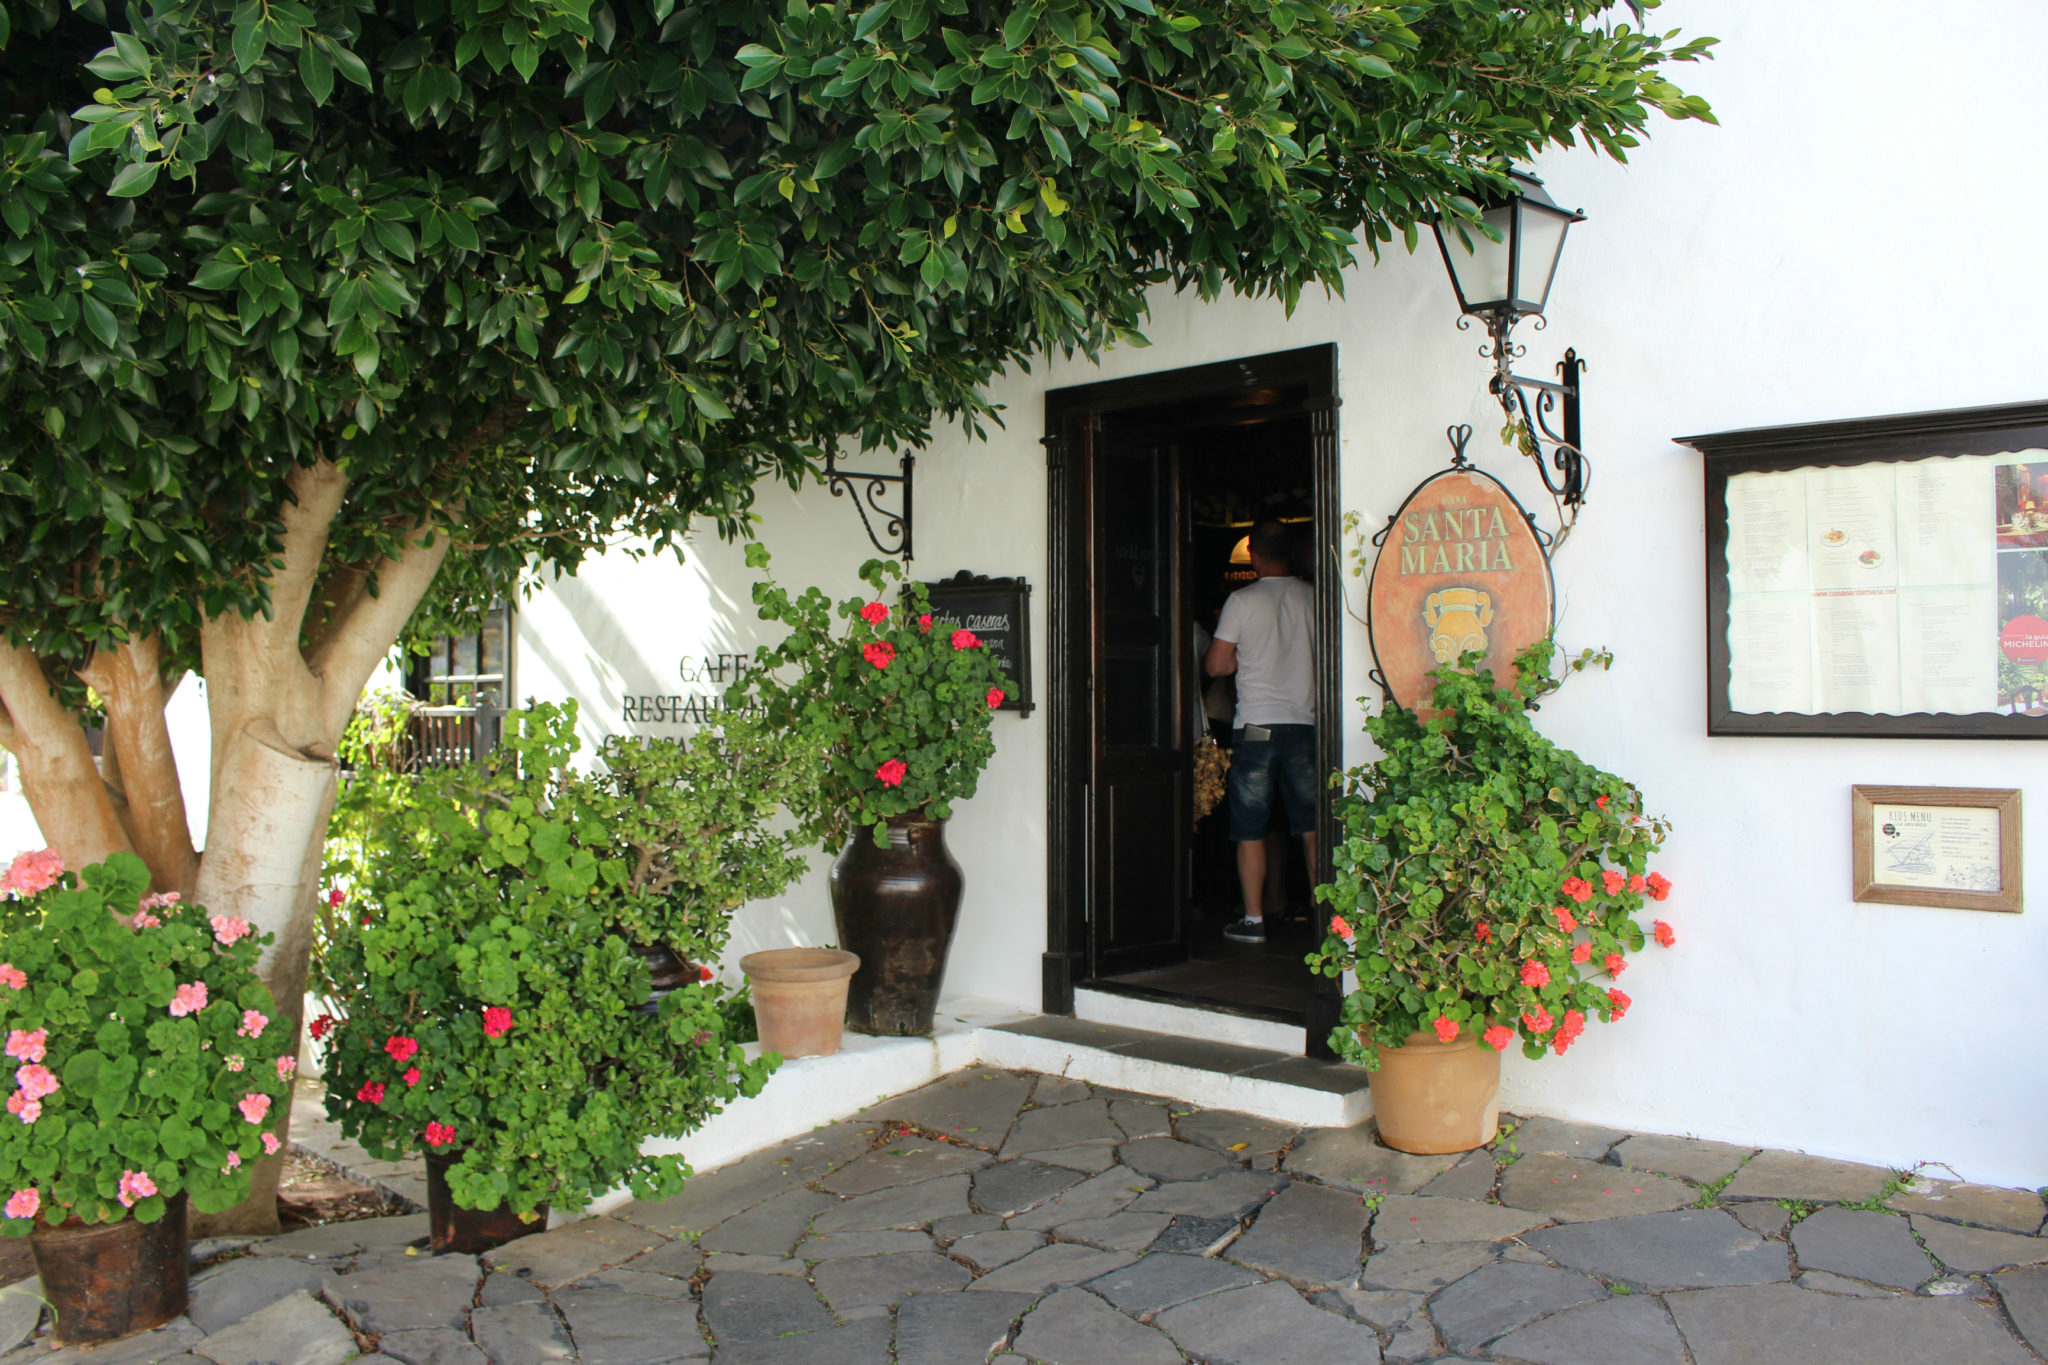 casa_santa_maria_2